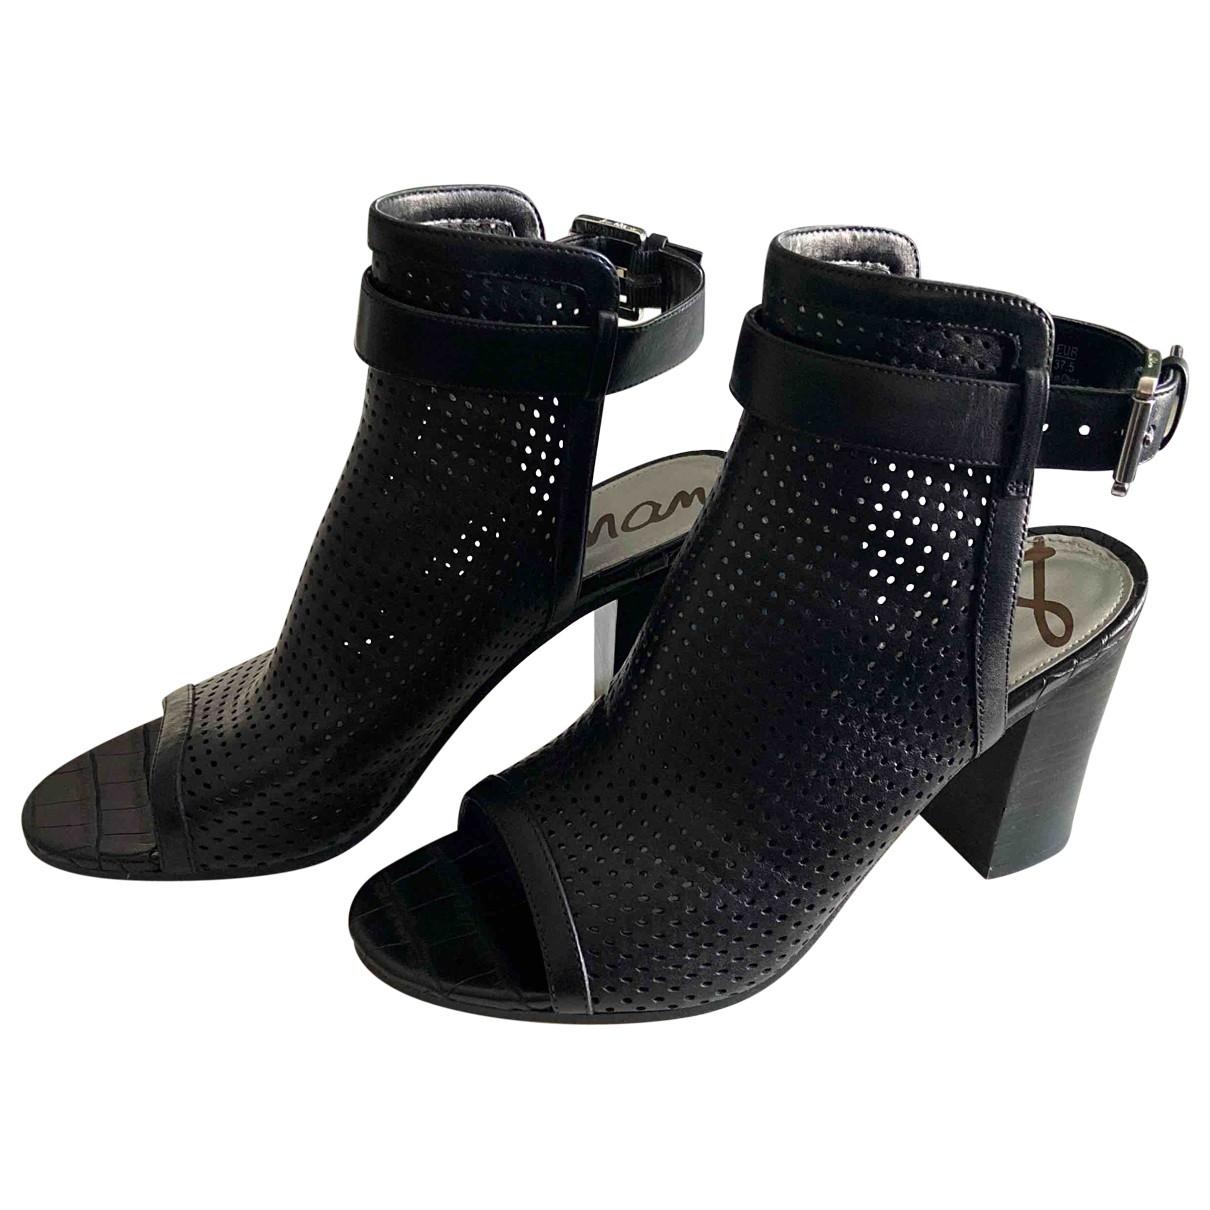 Sam Edelman \N Black Leather Sandals for Women 7.5 US